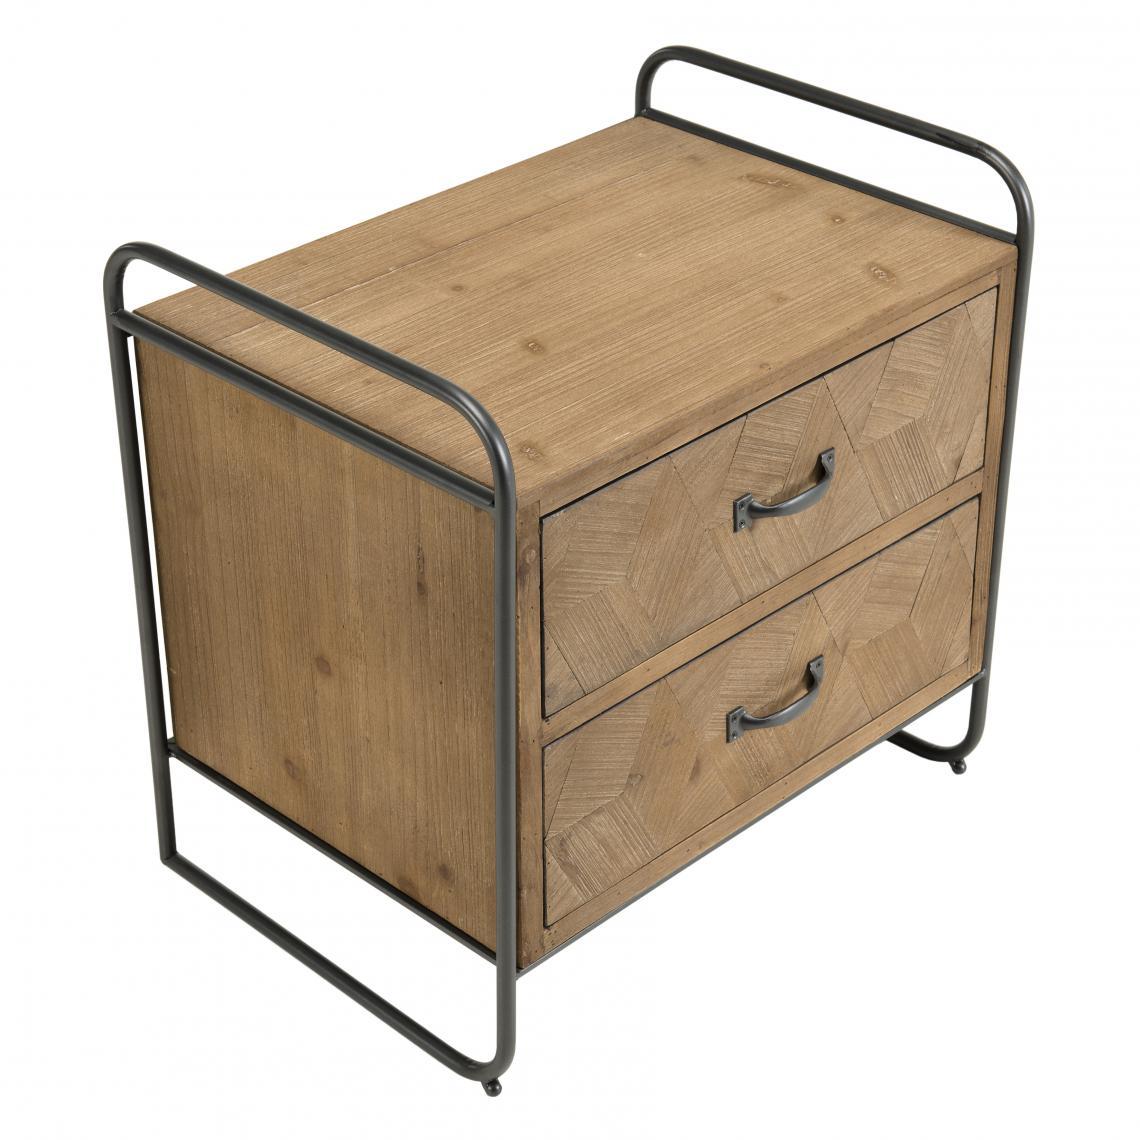 Table de chevet 2 tiroirs en Sapin et pieds métal - ZELYA ivojZ